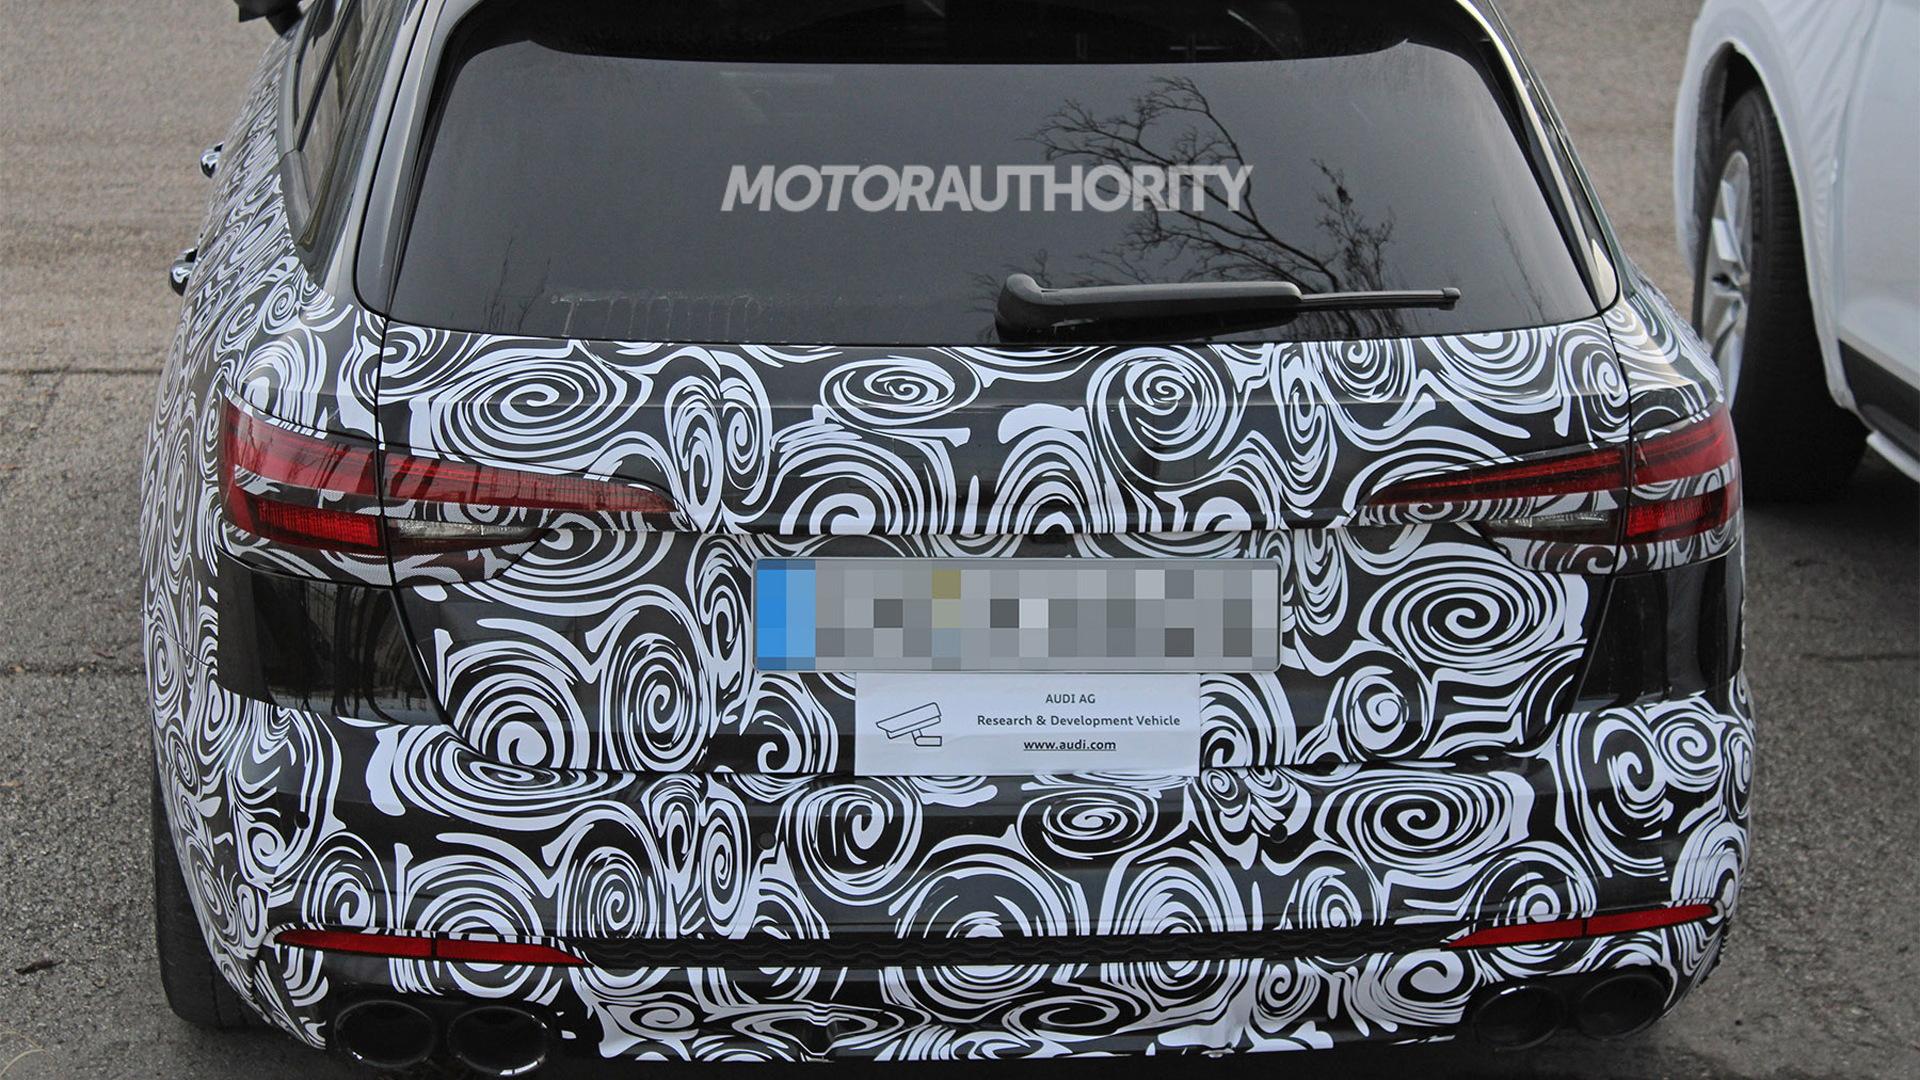 2021 Audi S4 Avant facelift spy shots - Image via S. Baldauf/SB-Medien